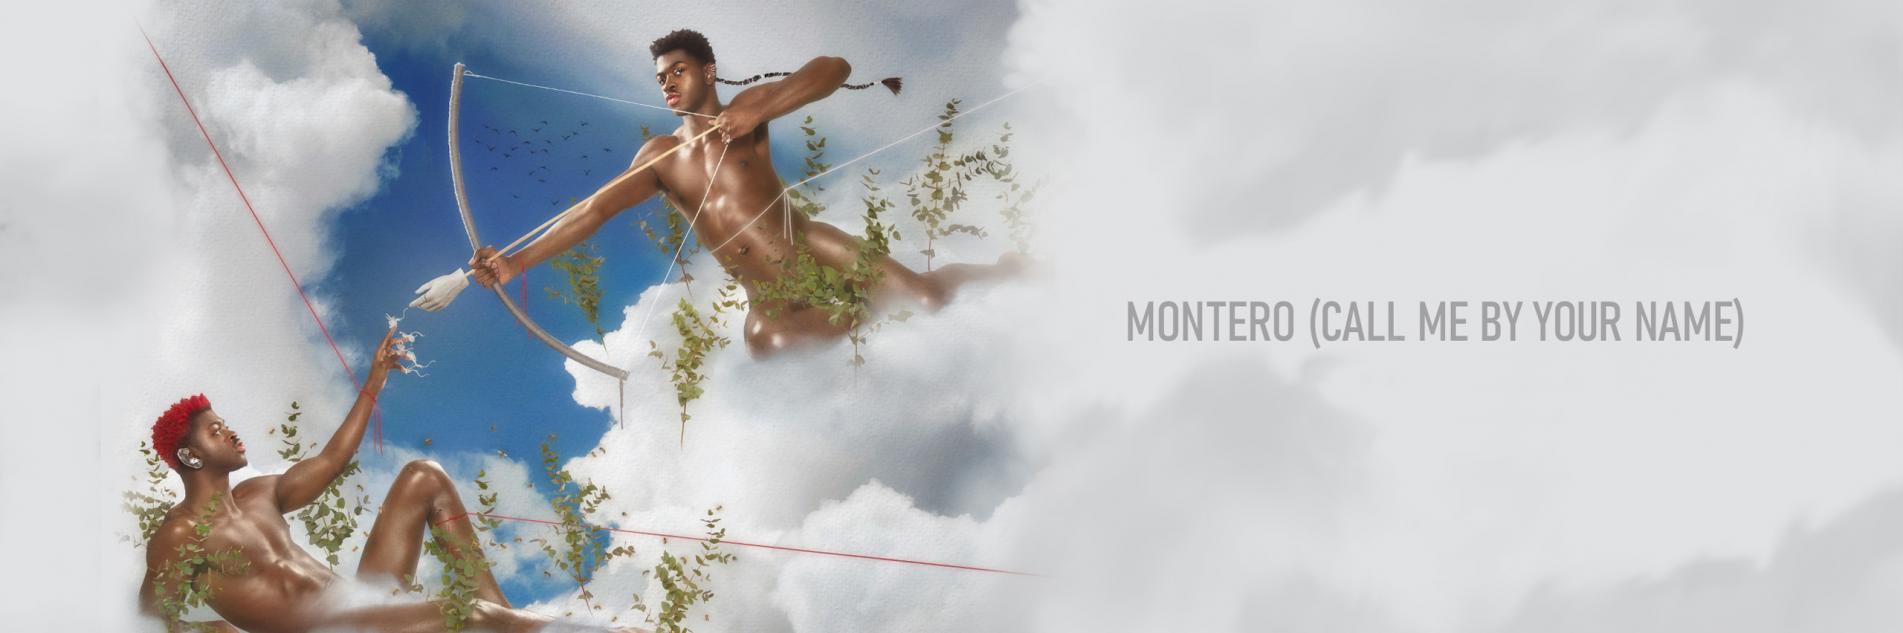 LIL NAS X banner